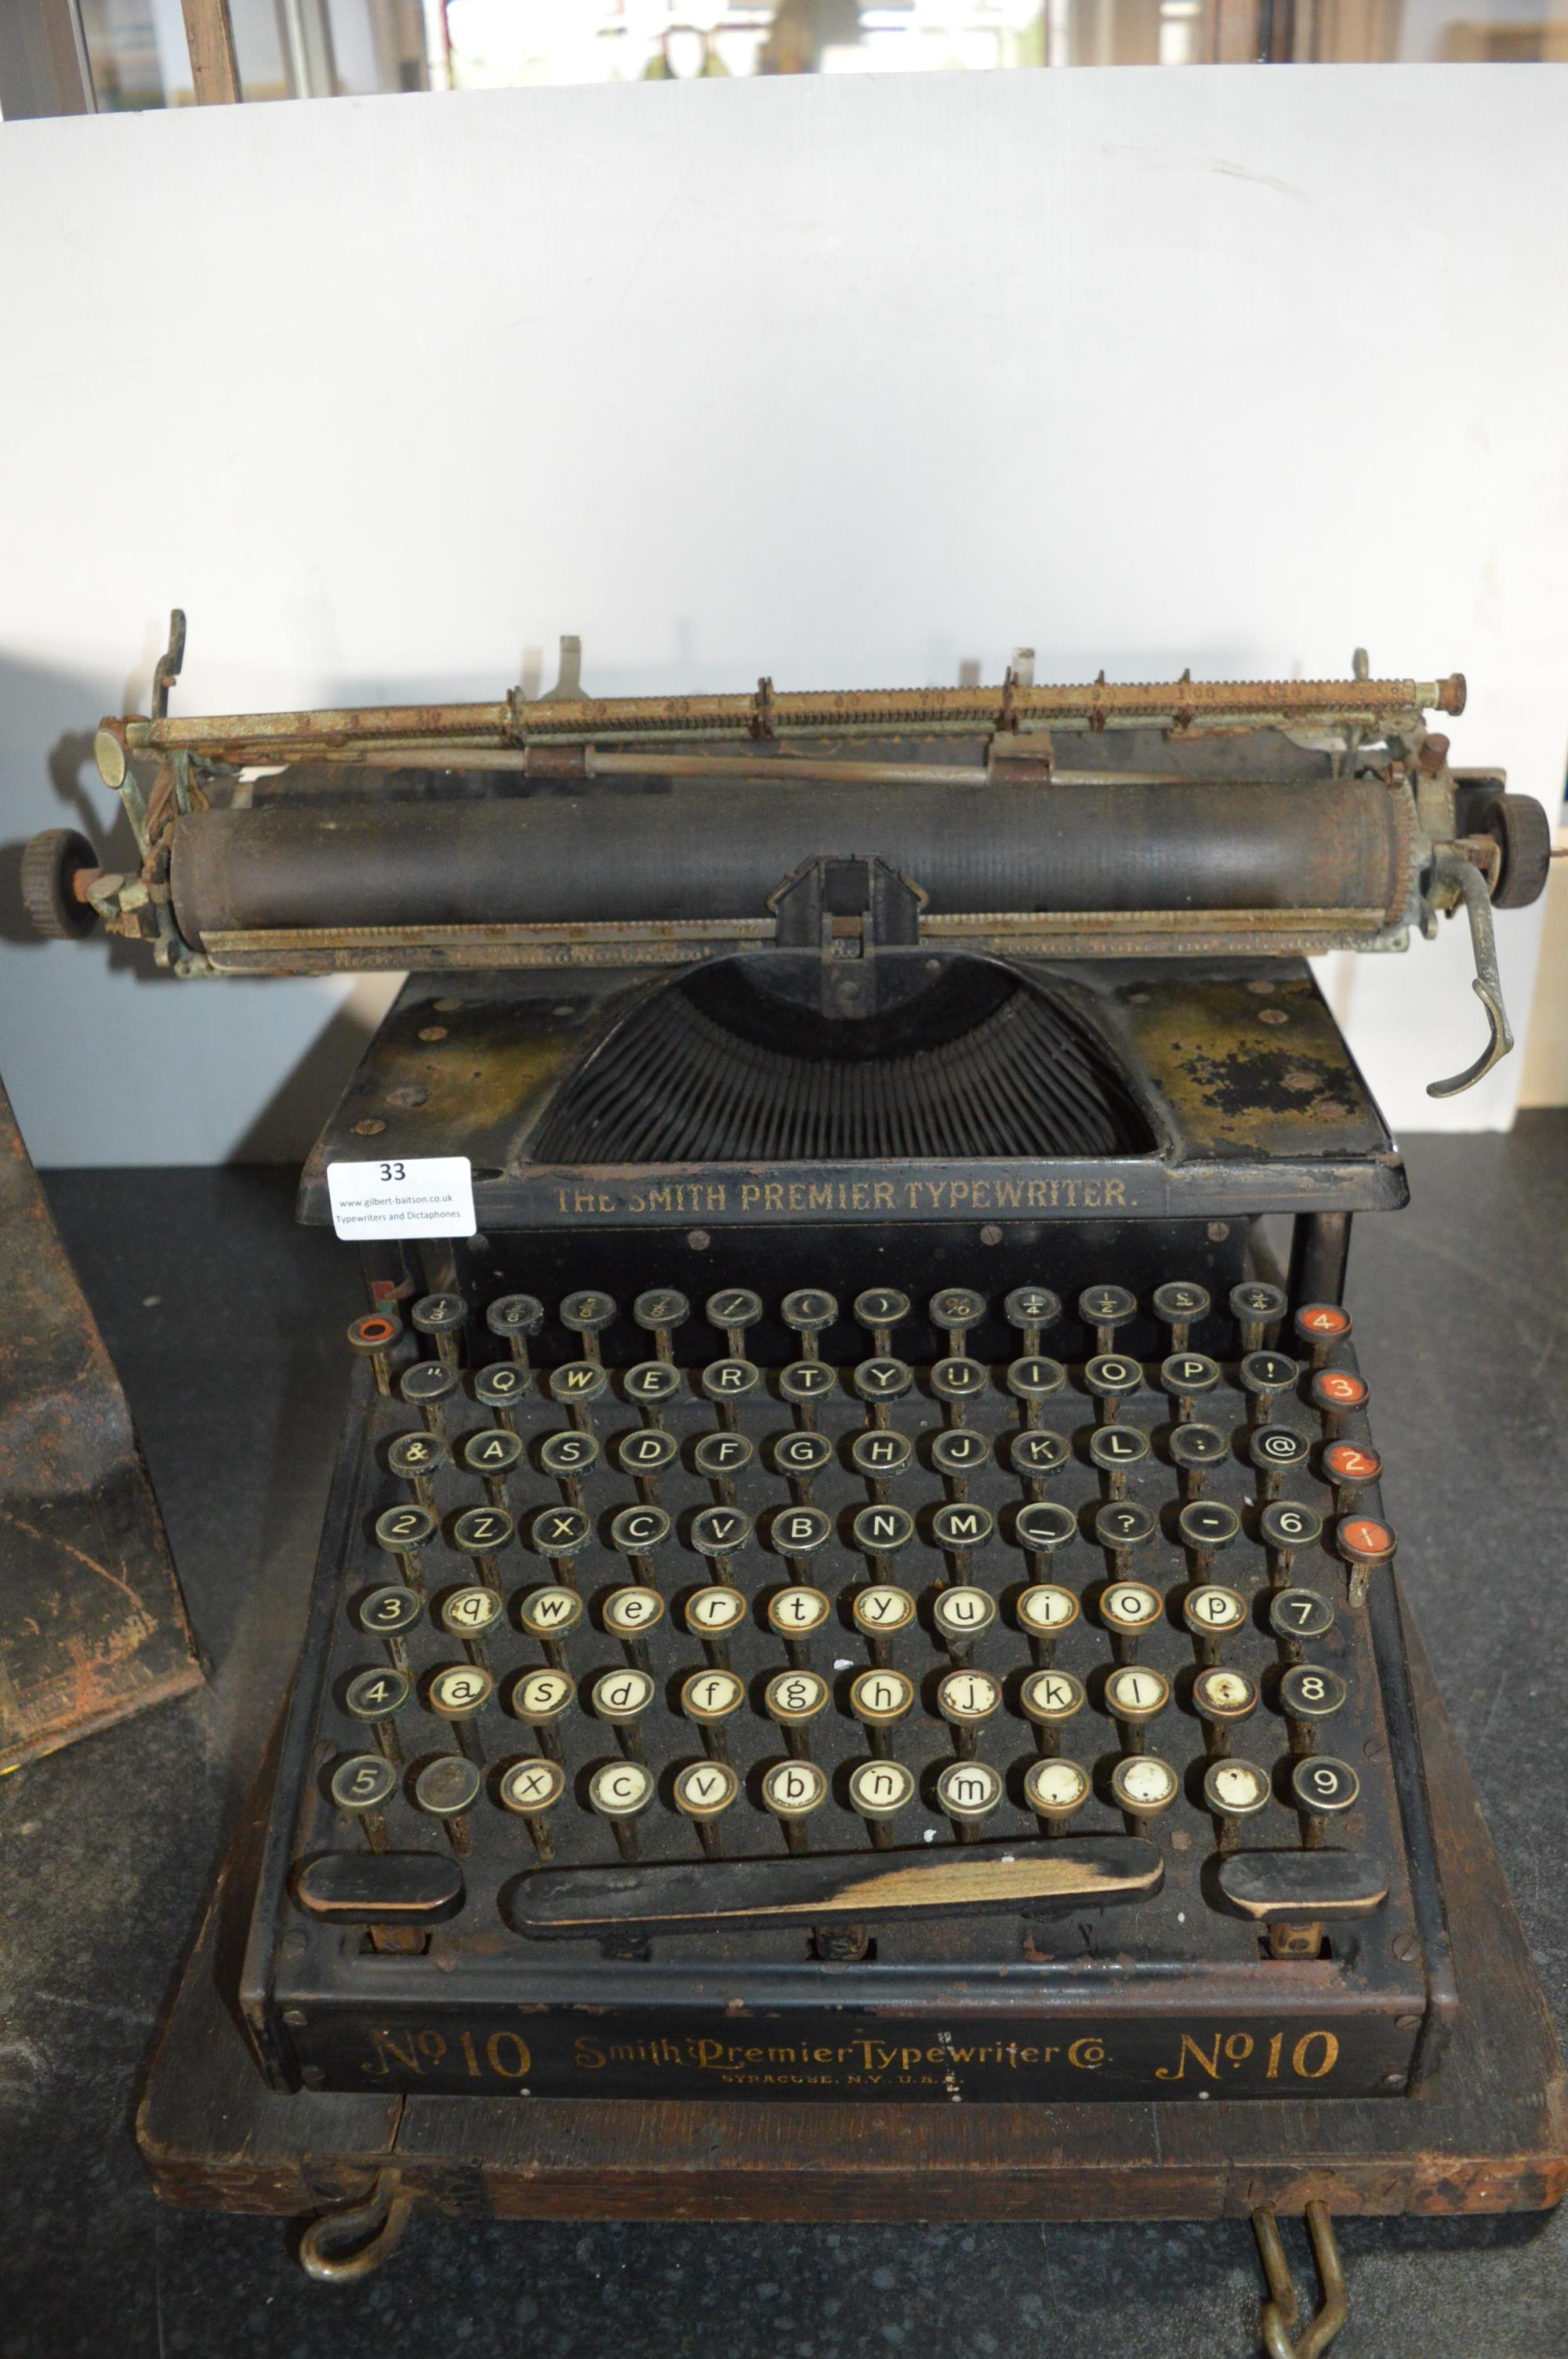 Smiths Premier No.10 Typewriter - Syracuse, New York, USA - Image 2 of 3